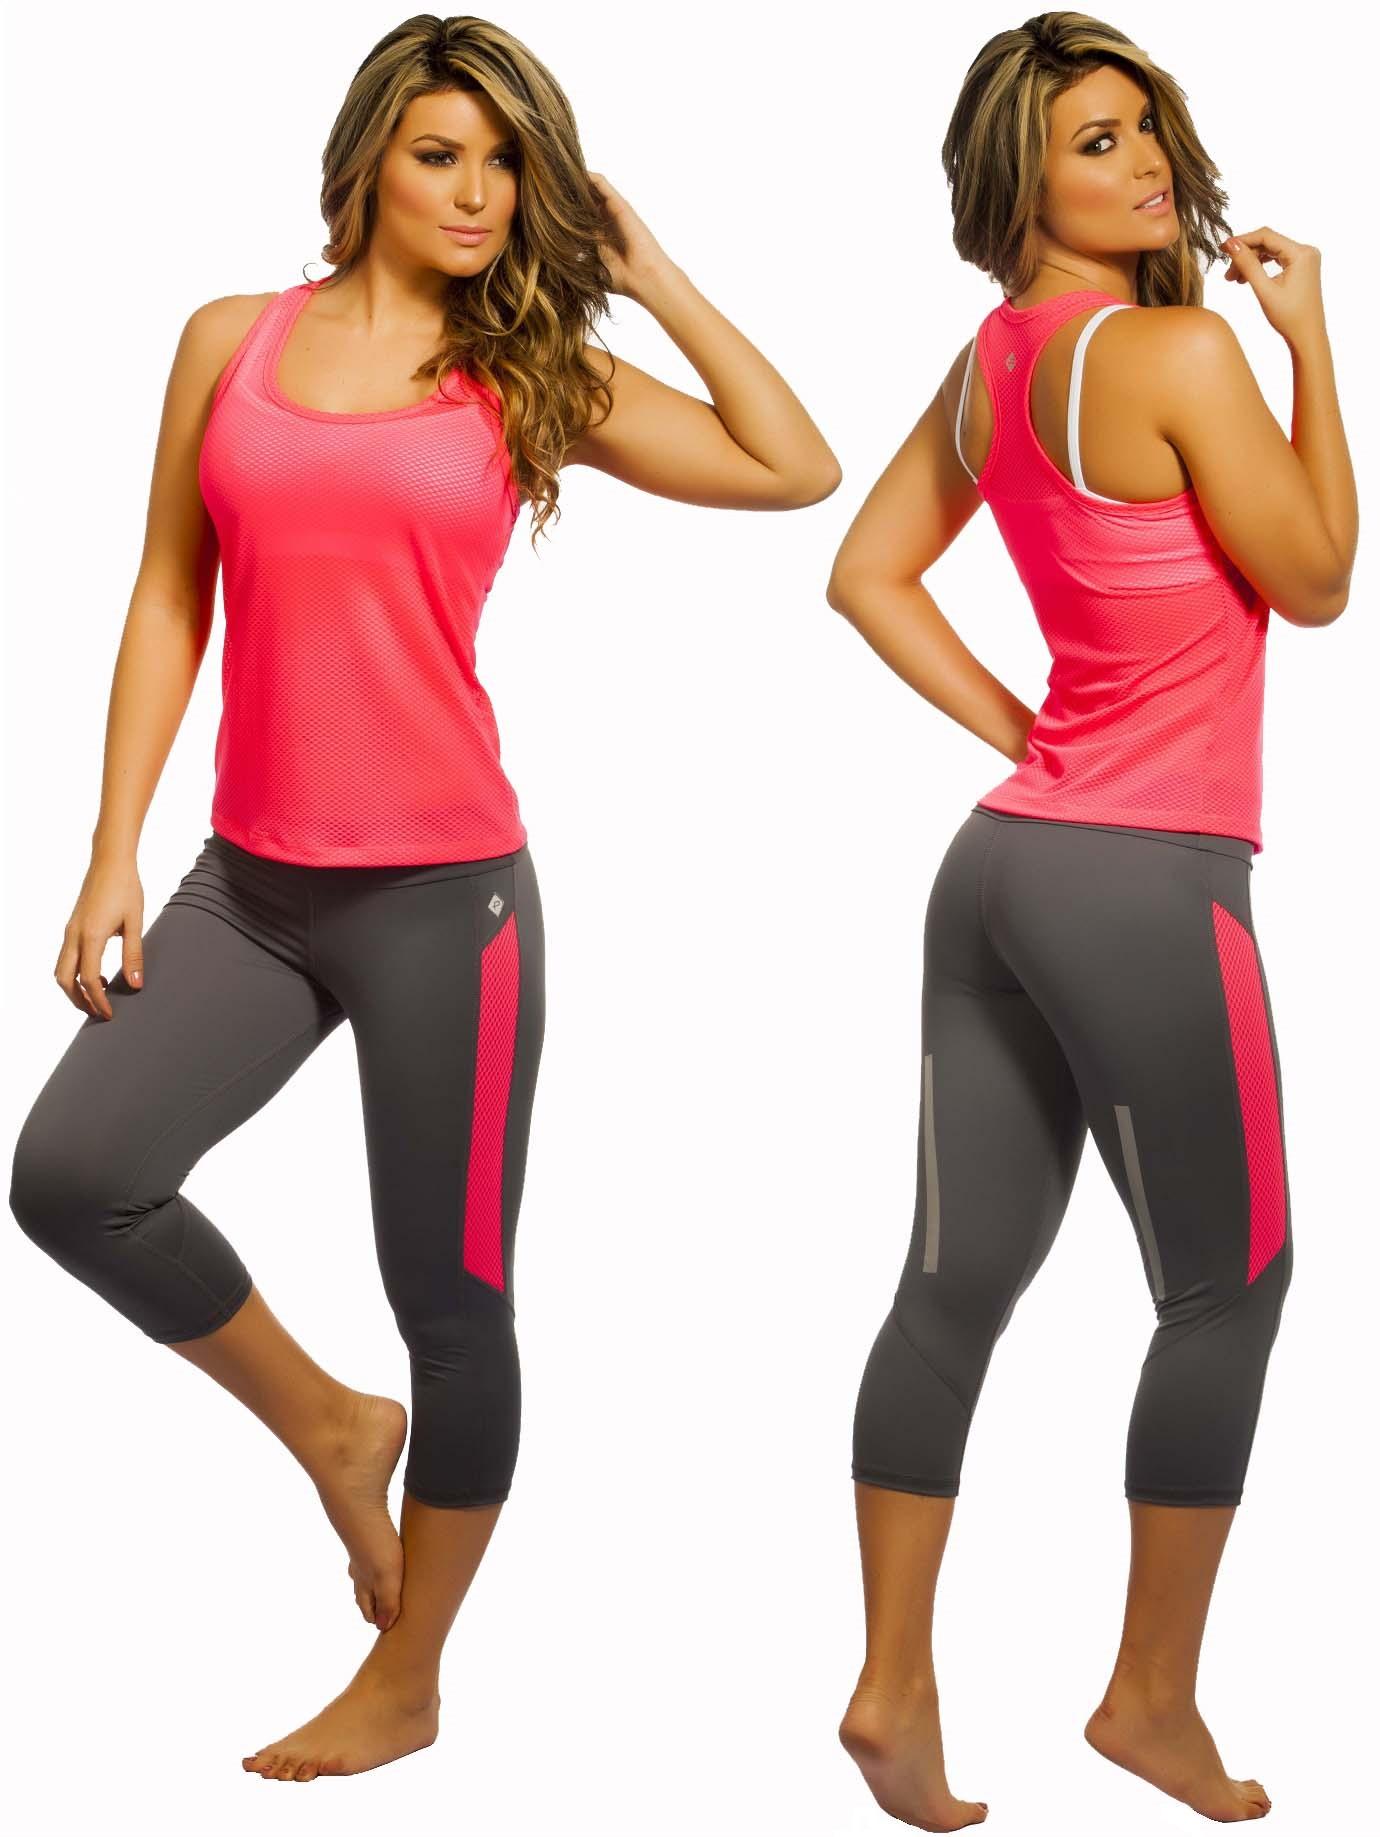 exercise clothes protokolo 2694 women athletic activewerar workout wear sports clothing    nelasportswear   jfoublh